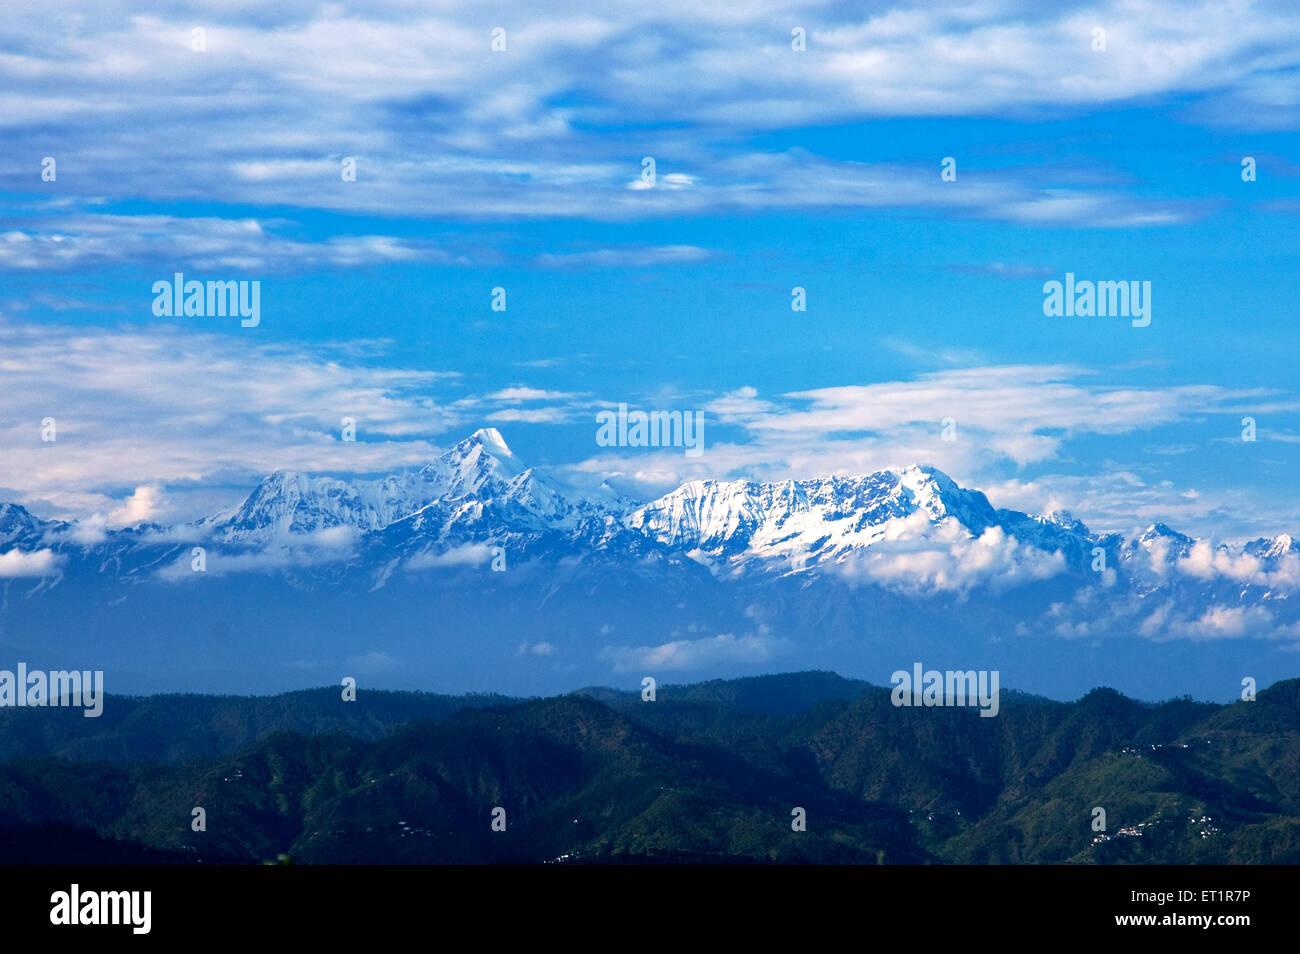 Cime innevate dell'himalaya uttarakhand India Asia Immagini Stock